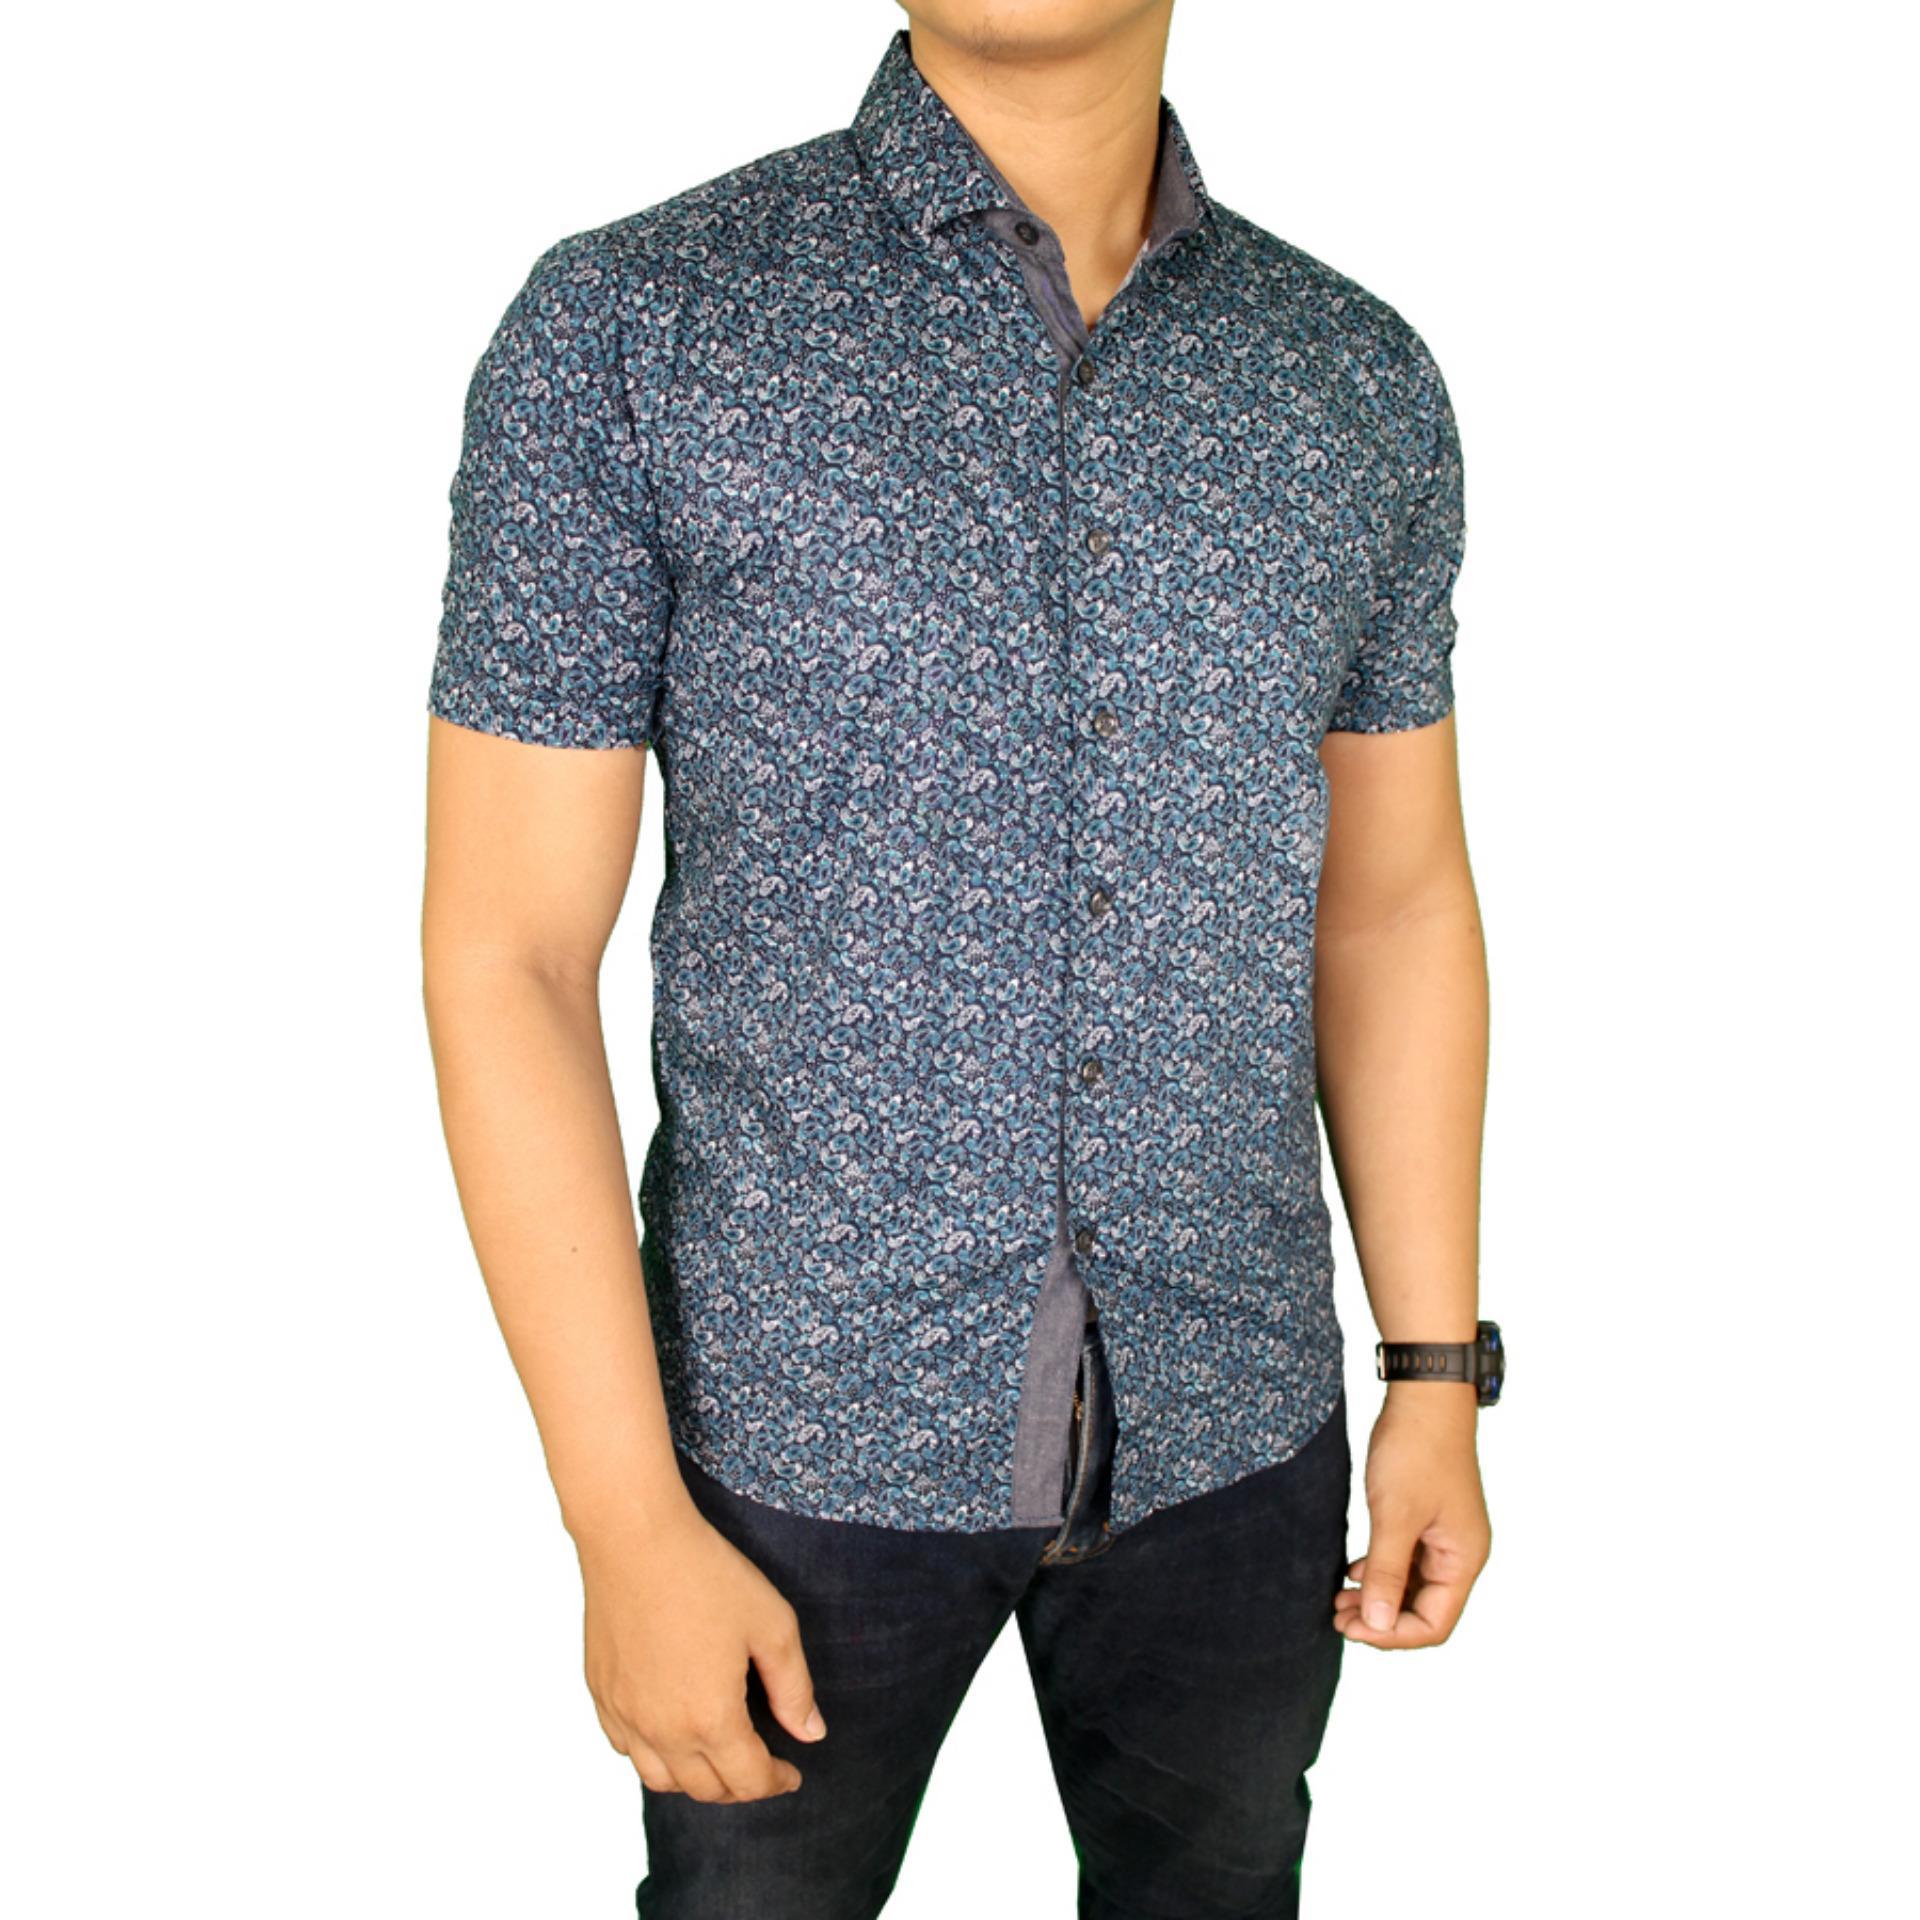 Spesifikasi Gudang Fashion Baju Batik Pria Slim Fit Biru Merk Gudang Fashion